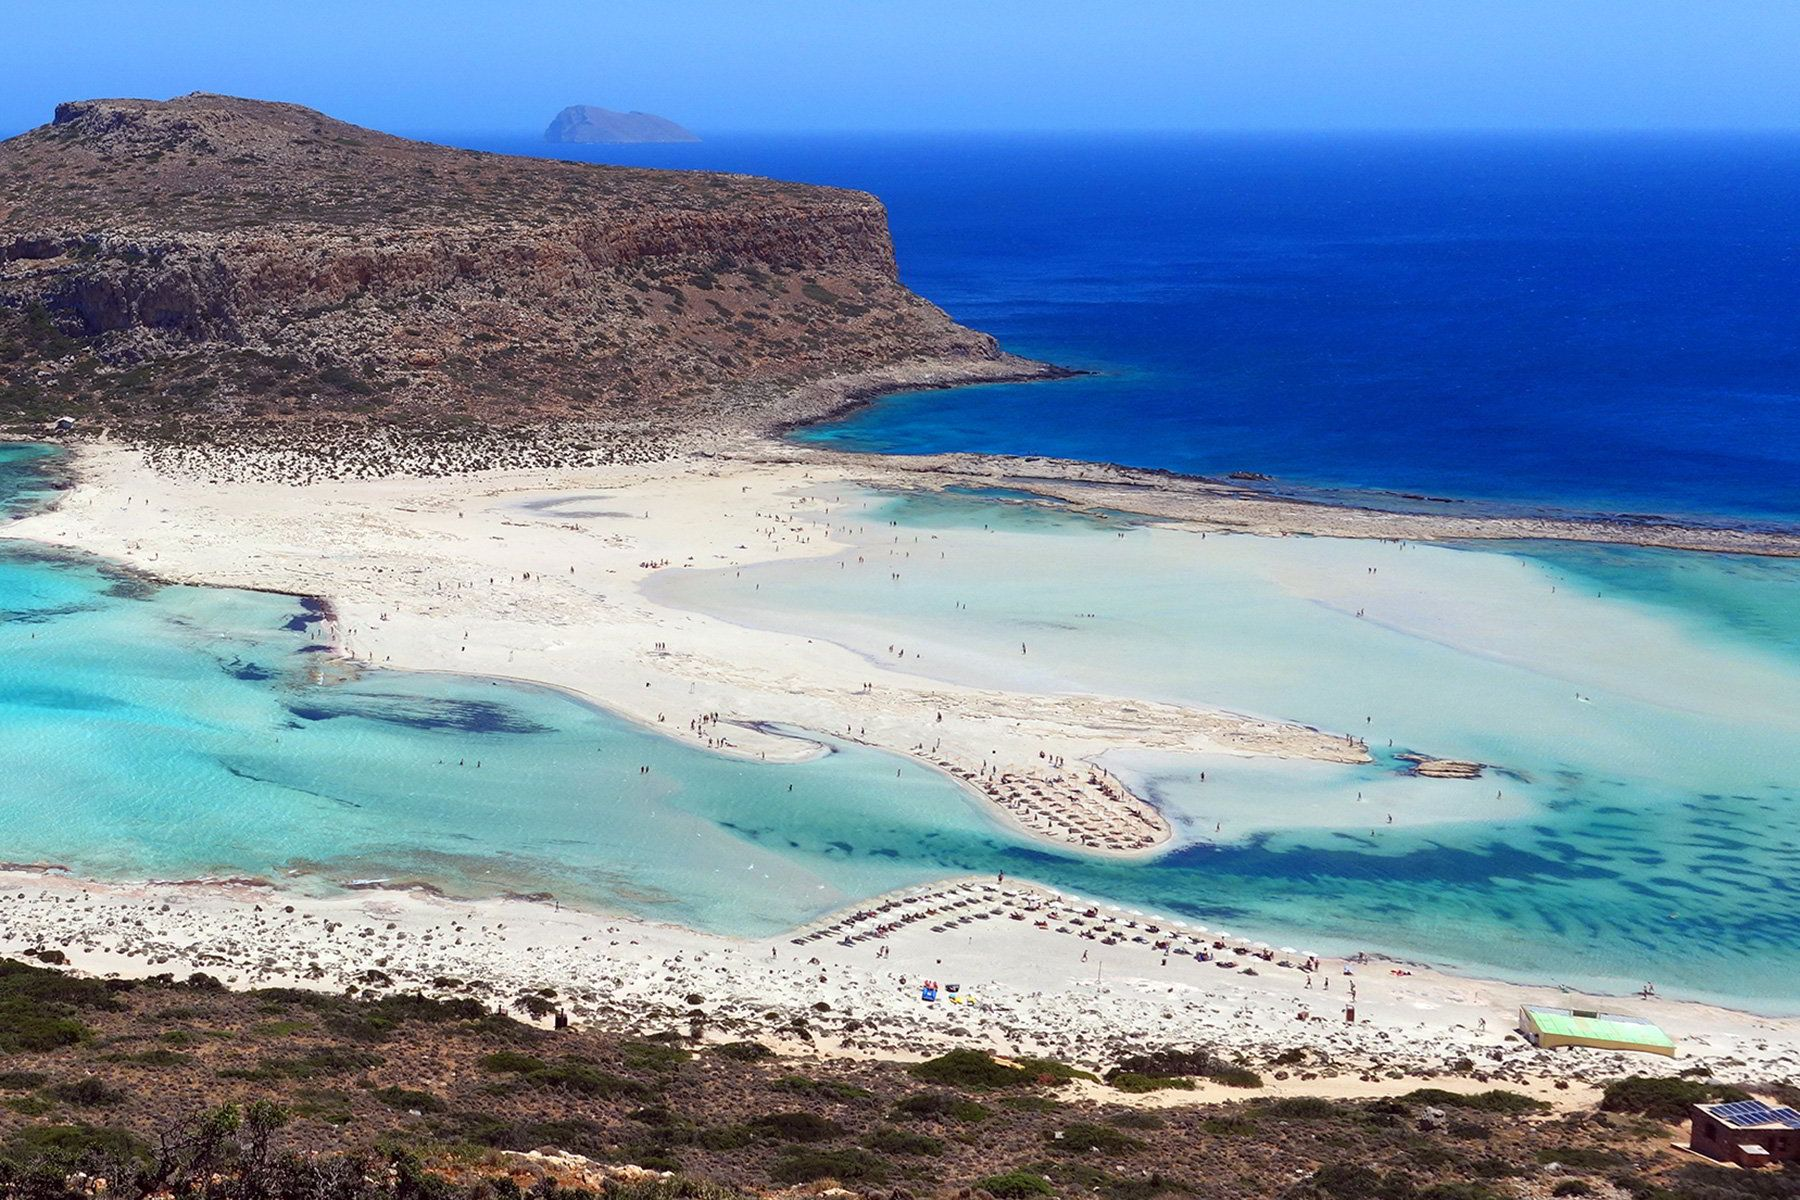 crete captain nemo islands tours